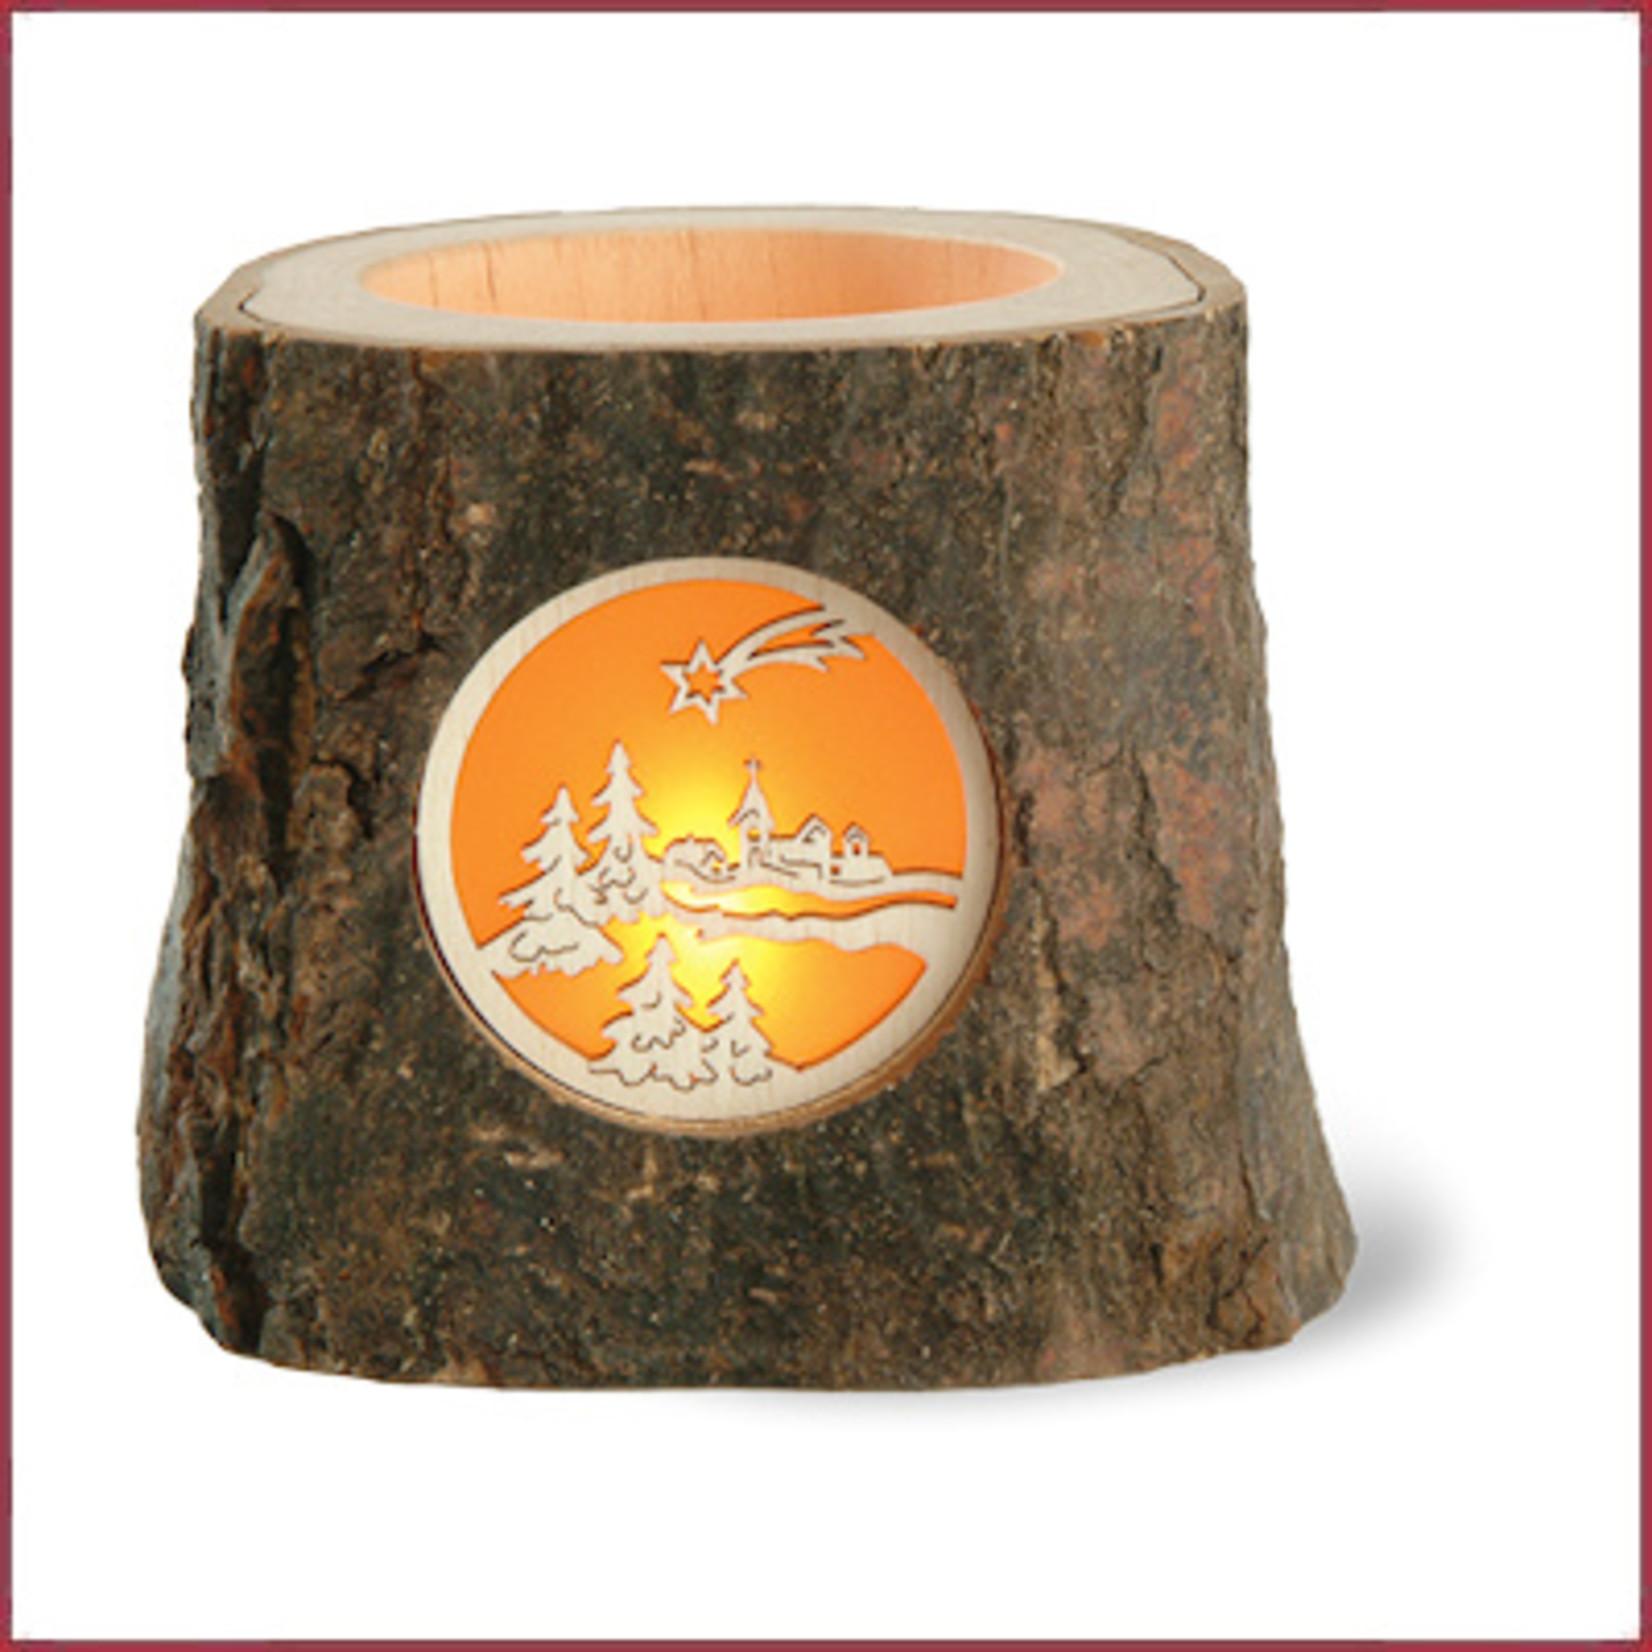 Waldfabrik Waxinelichtje boomschors